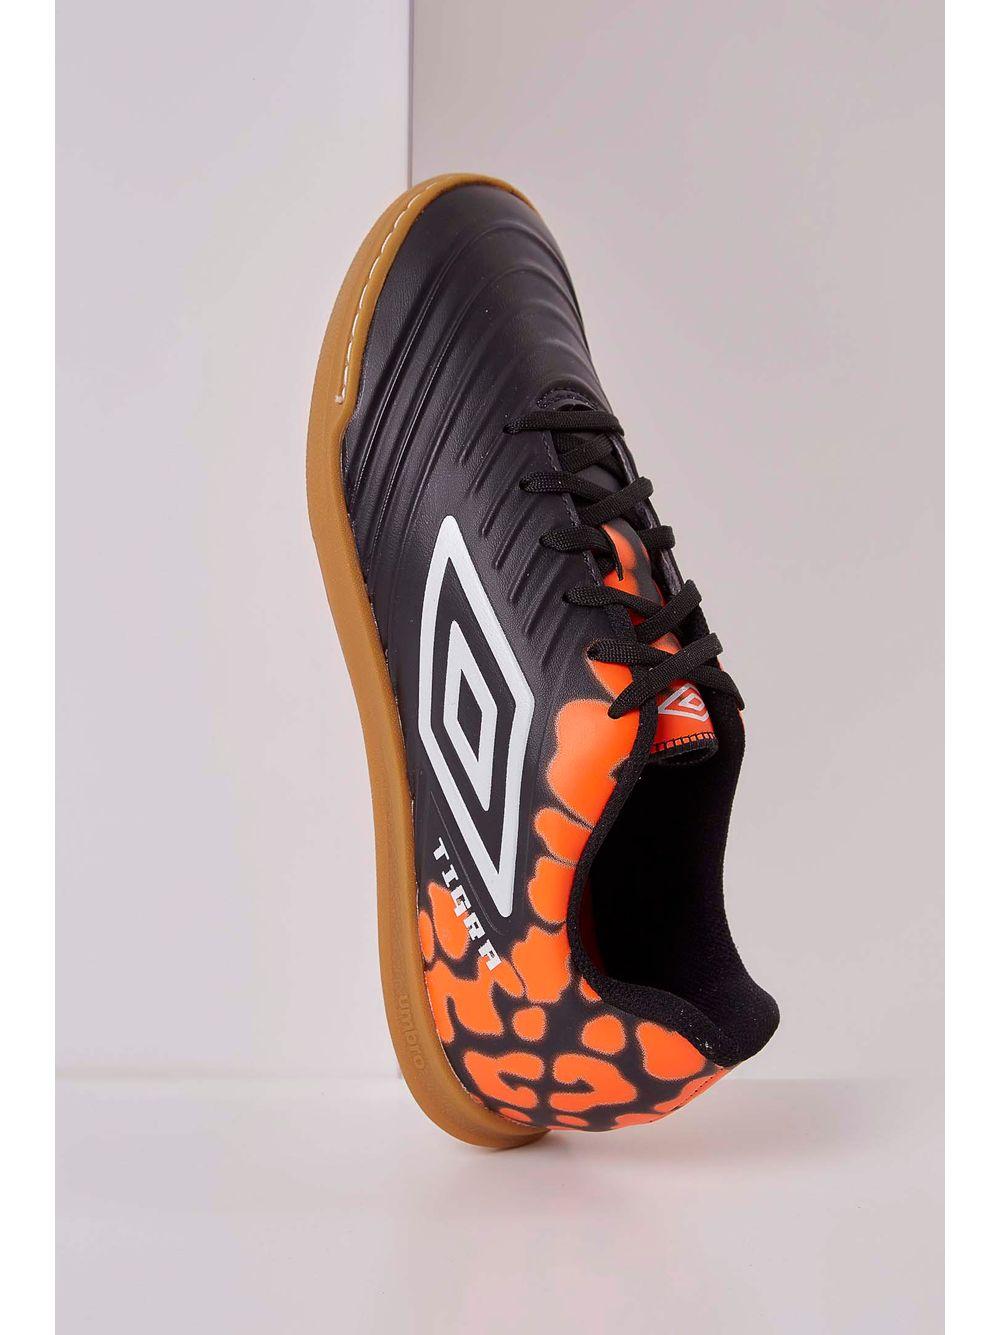 Chuteira Umbro Tigra Futsal Preto - pittol 1a21c7d4f4570